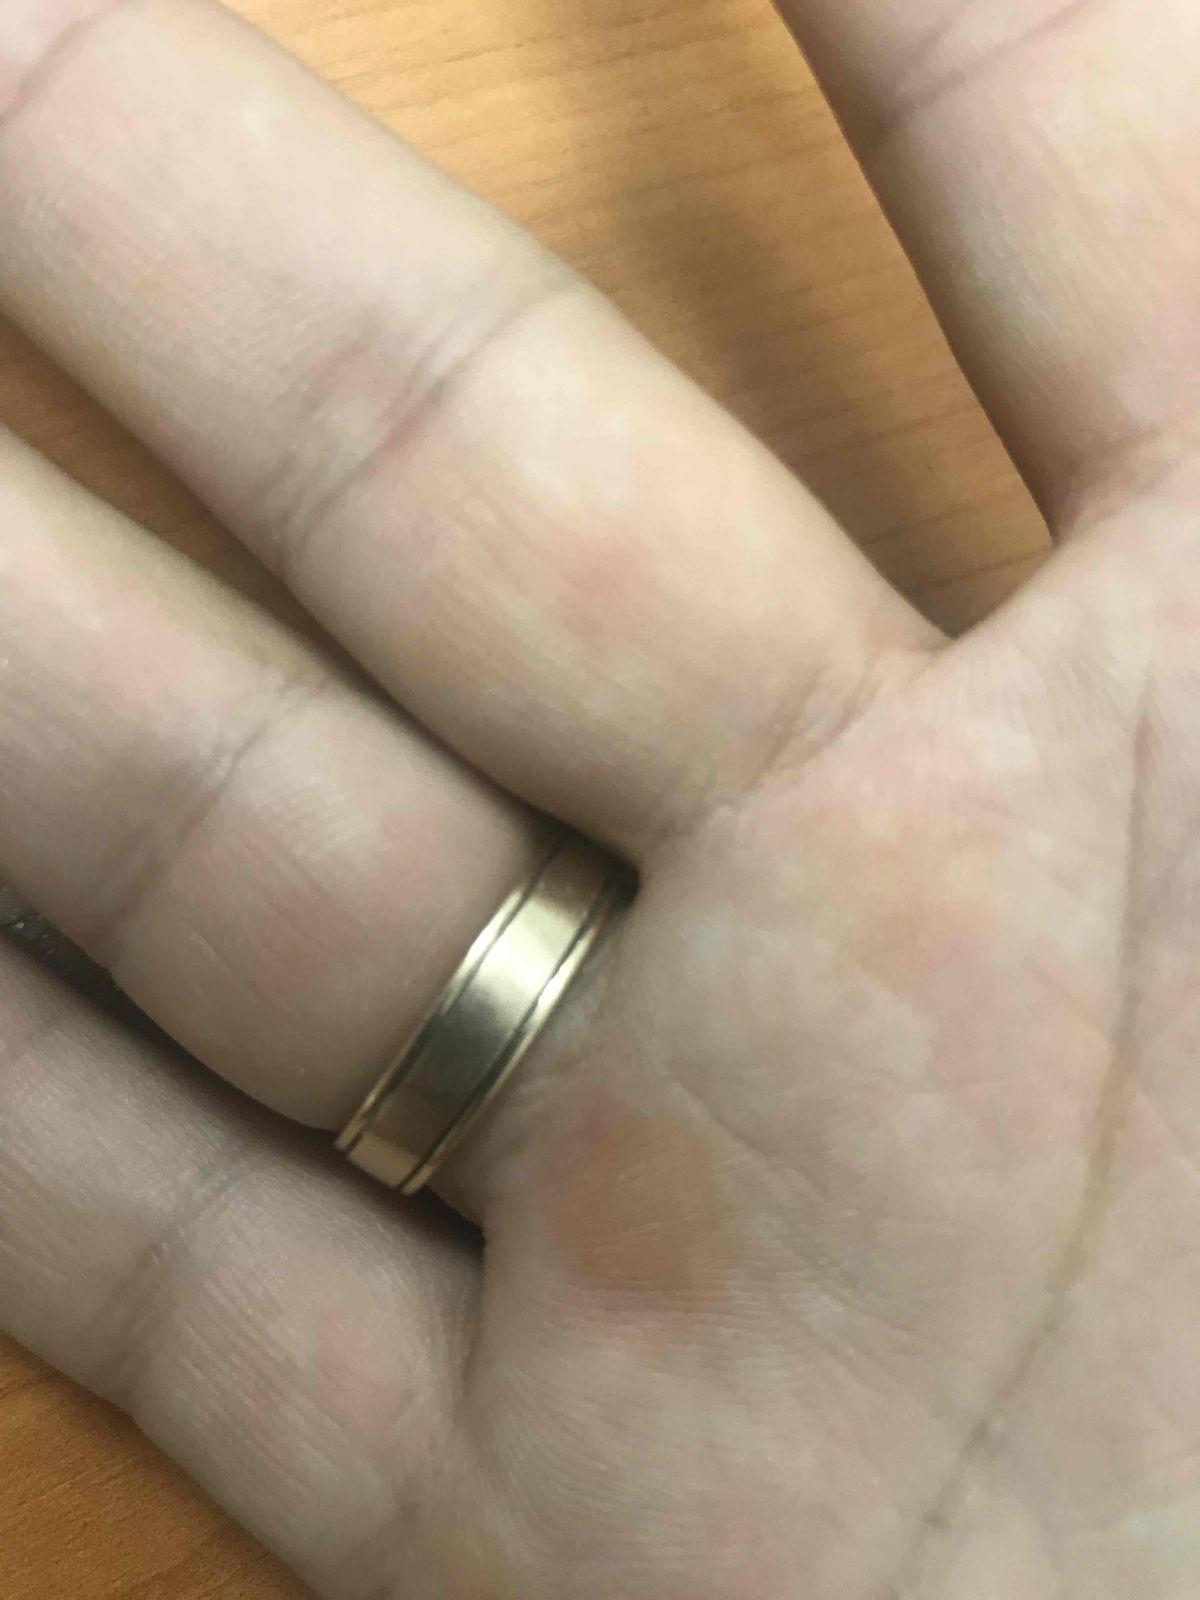 Стерлась середина-главная фишка кольца